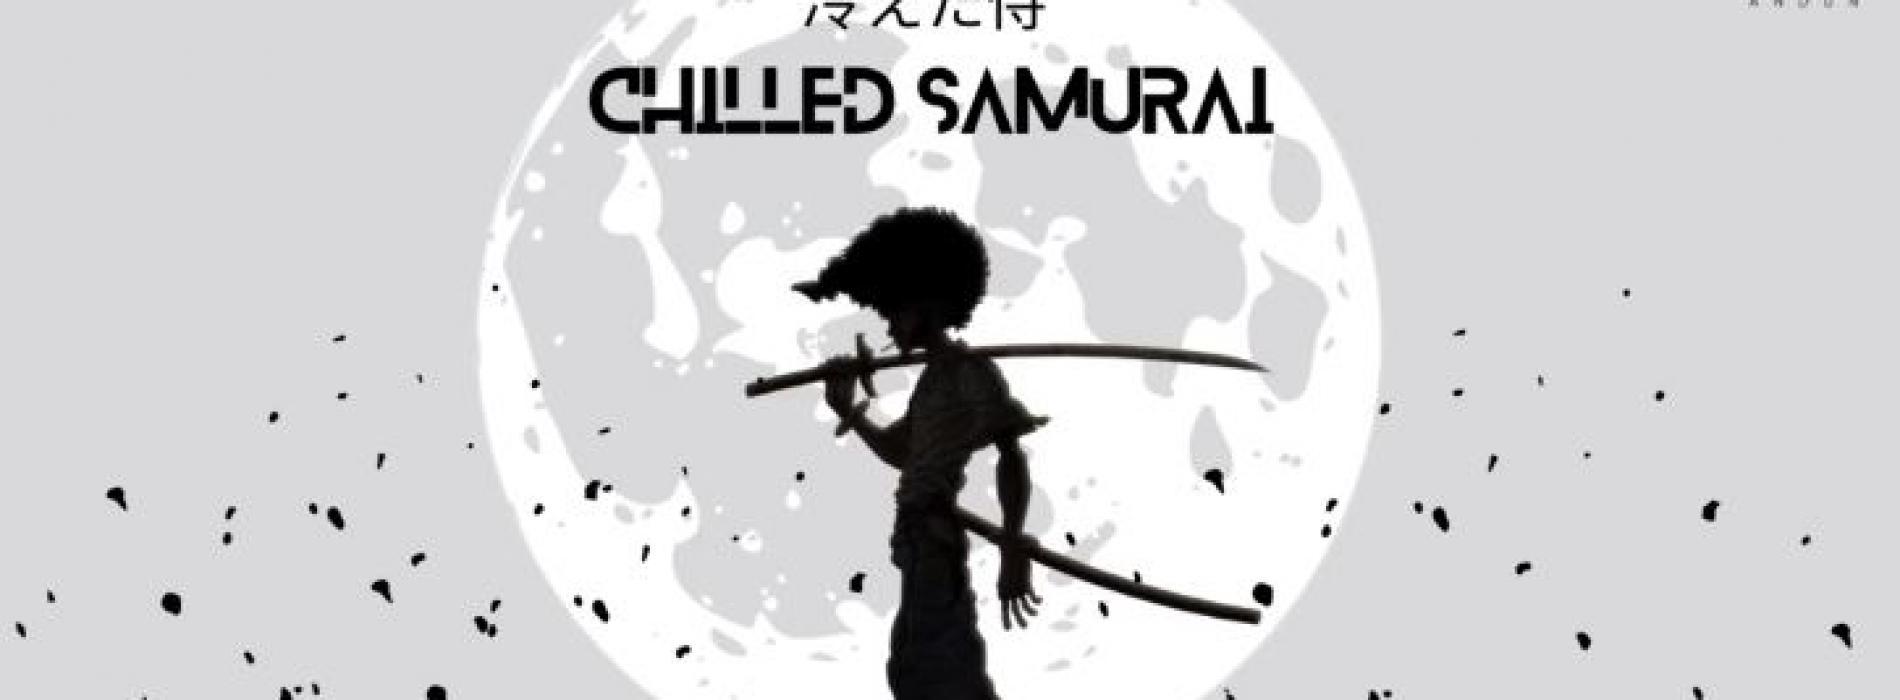 New Music : Andun – Chilled Samurai   Lo-Fi (Hip-Hop Beats)   [Samurai Vibe]